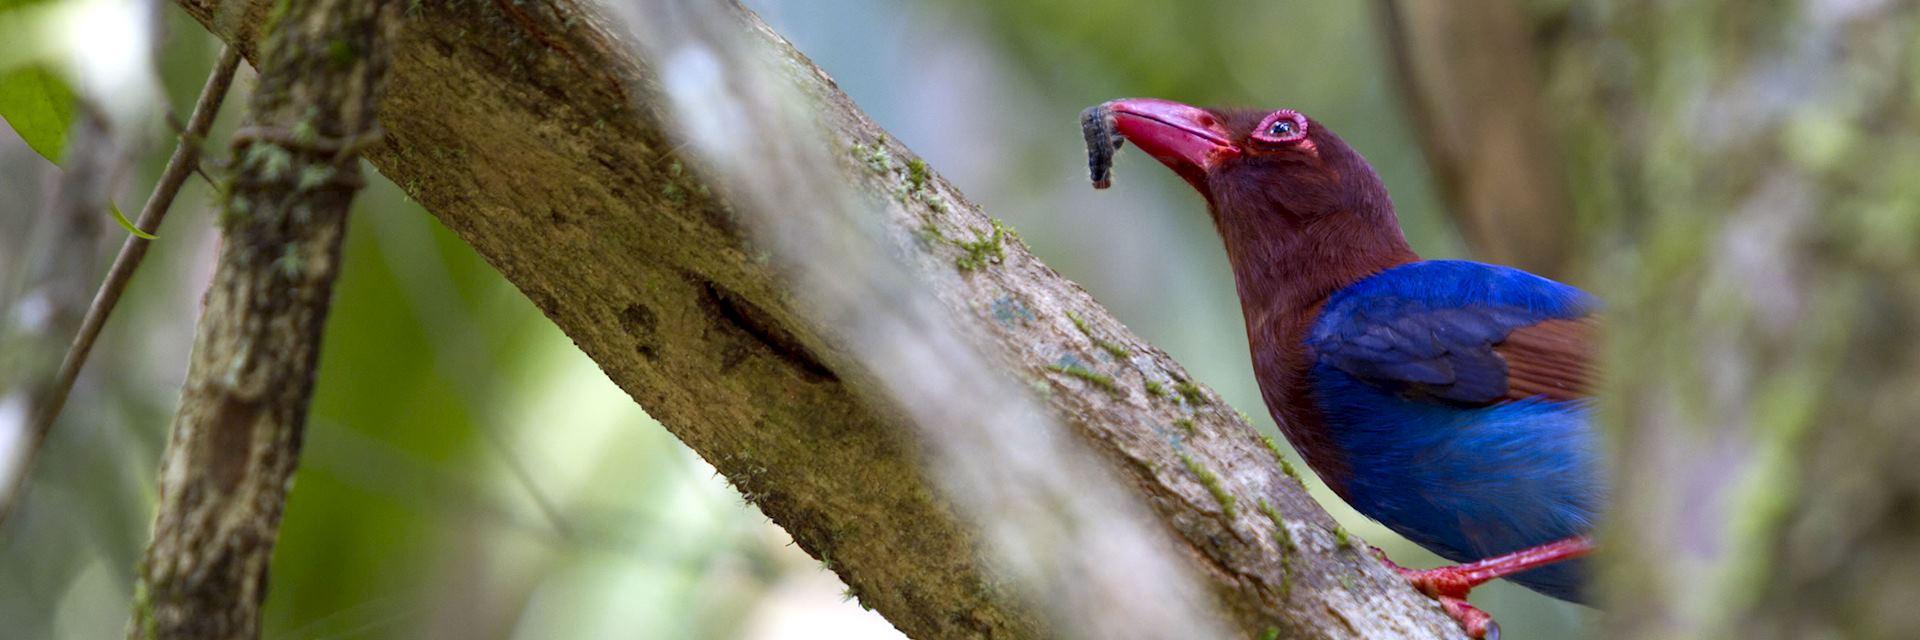 Sri Lanka blue magpie, Sinharaja Biosphere